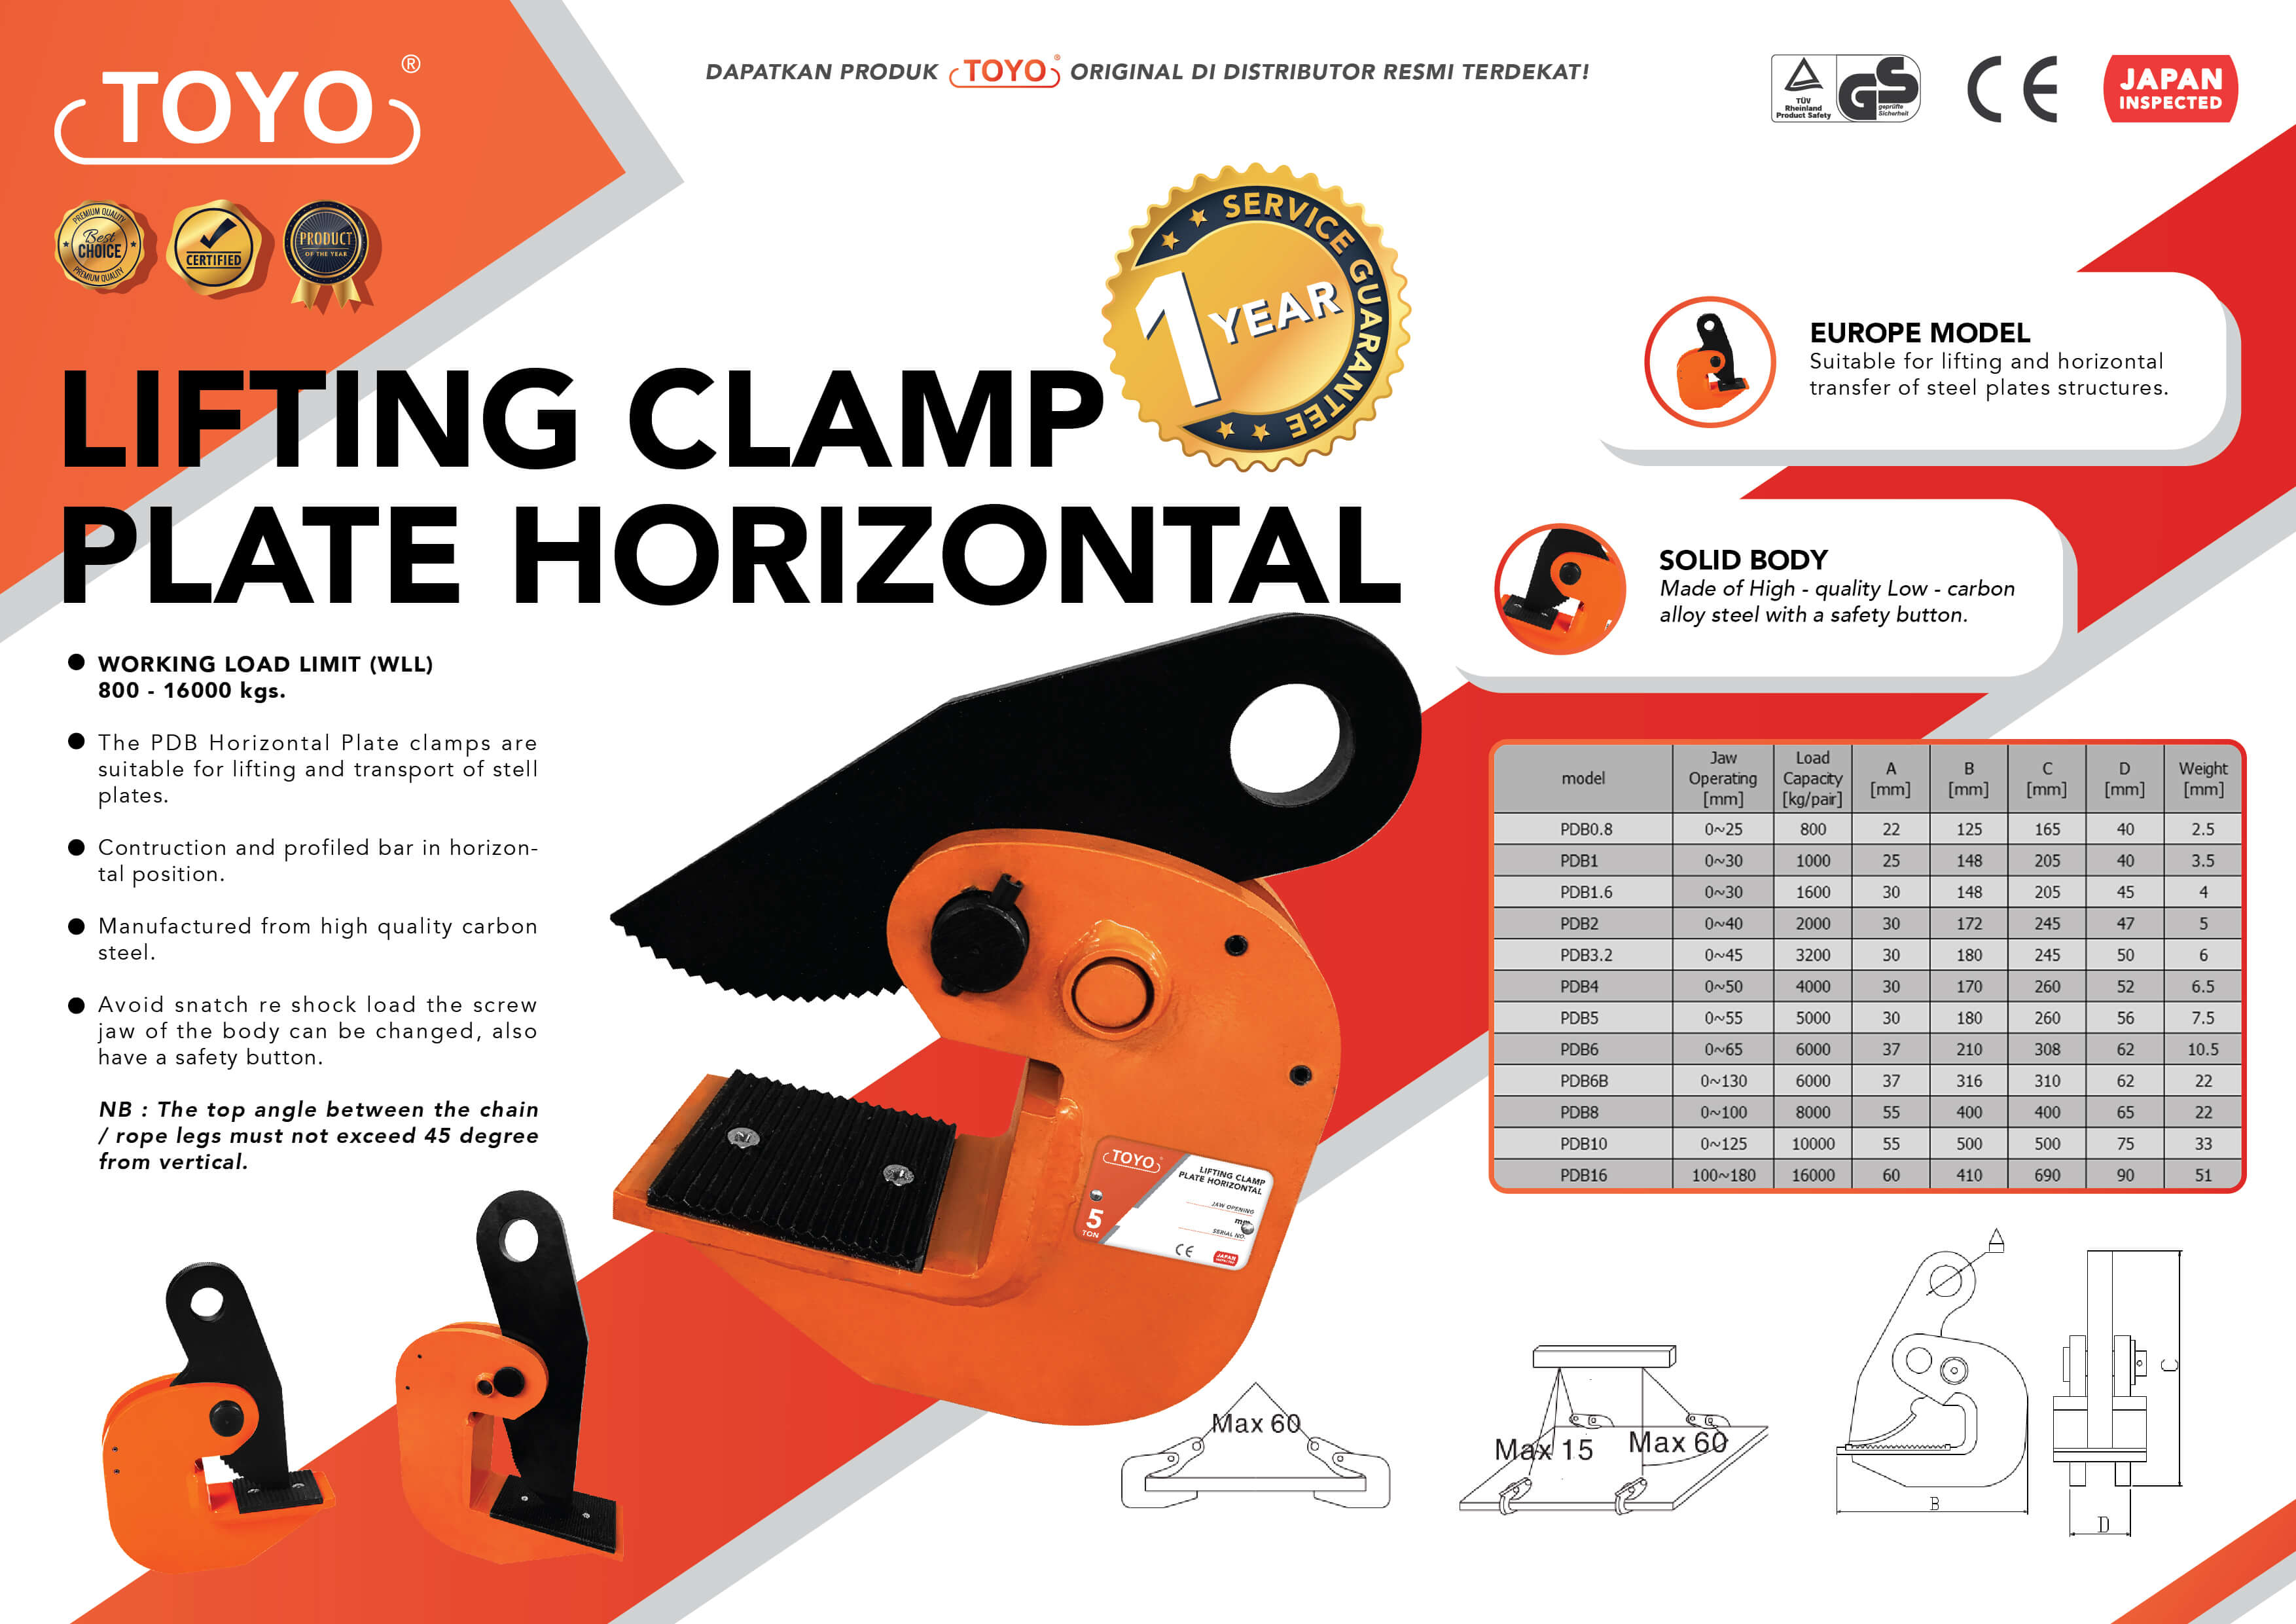 Spesifikasi Detail Lifting Clamp Plate Horizontal Toyo Original